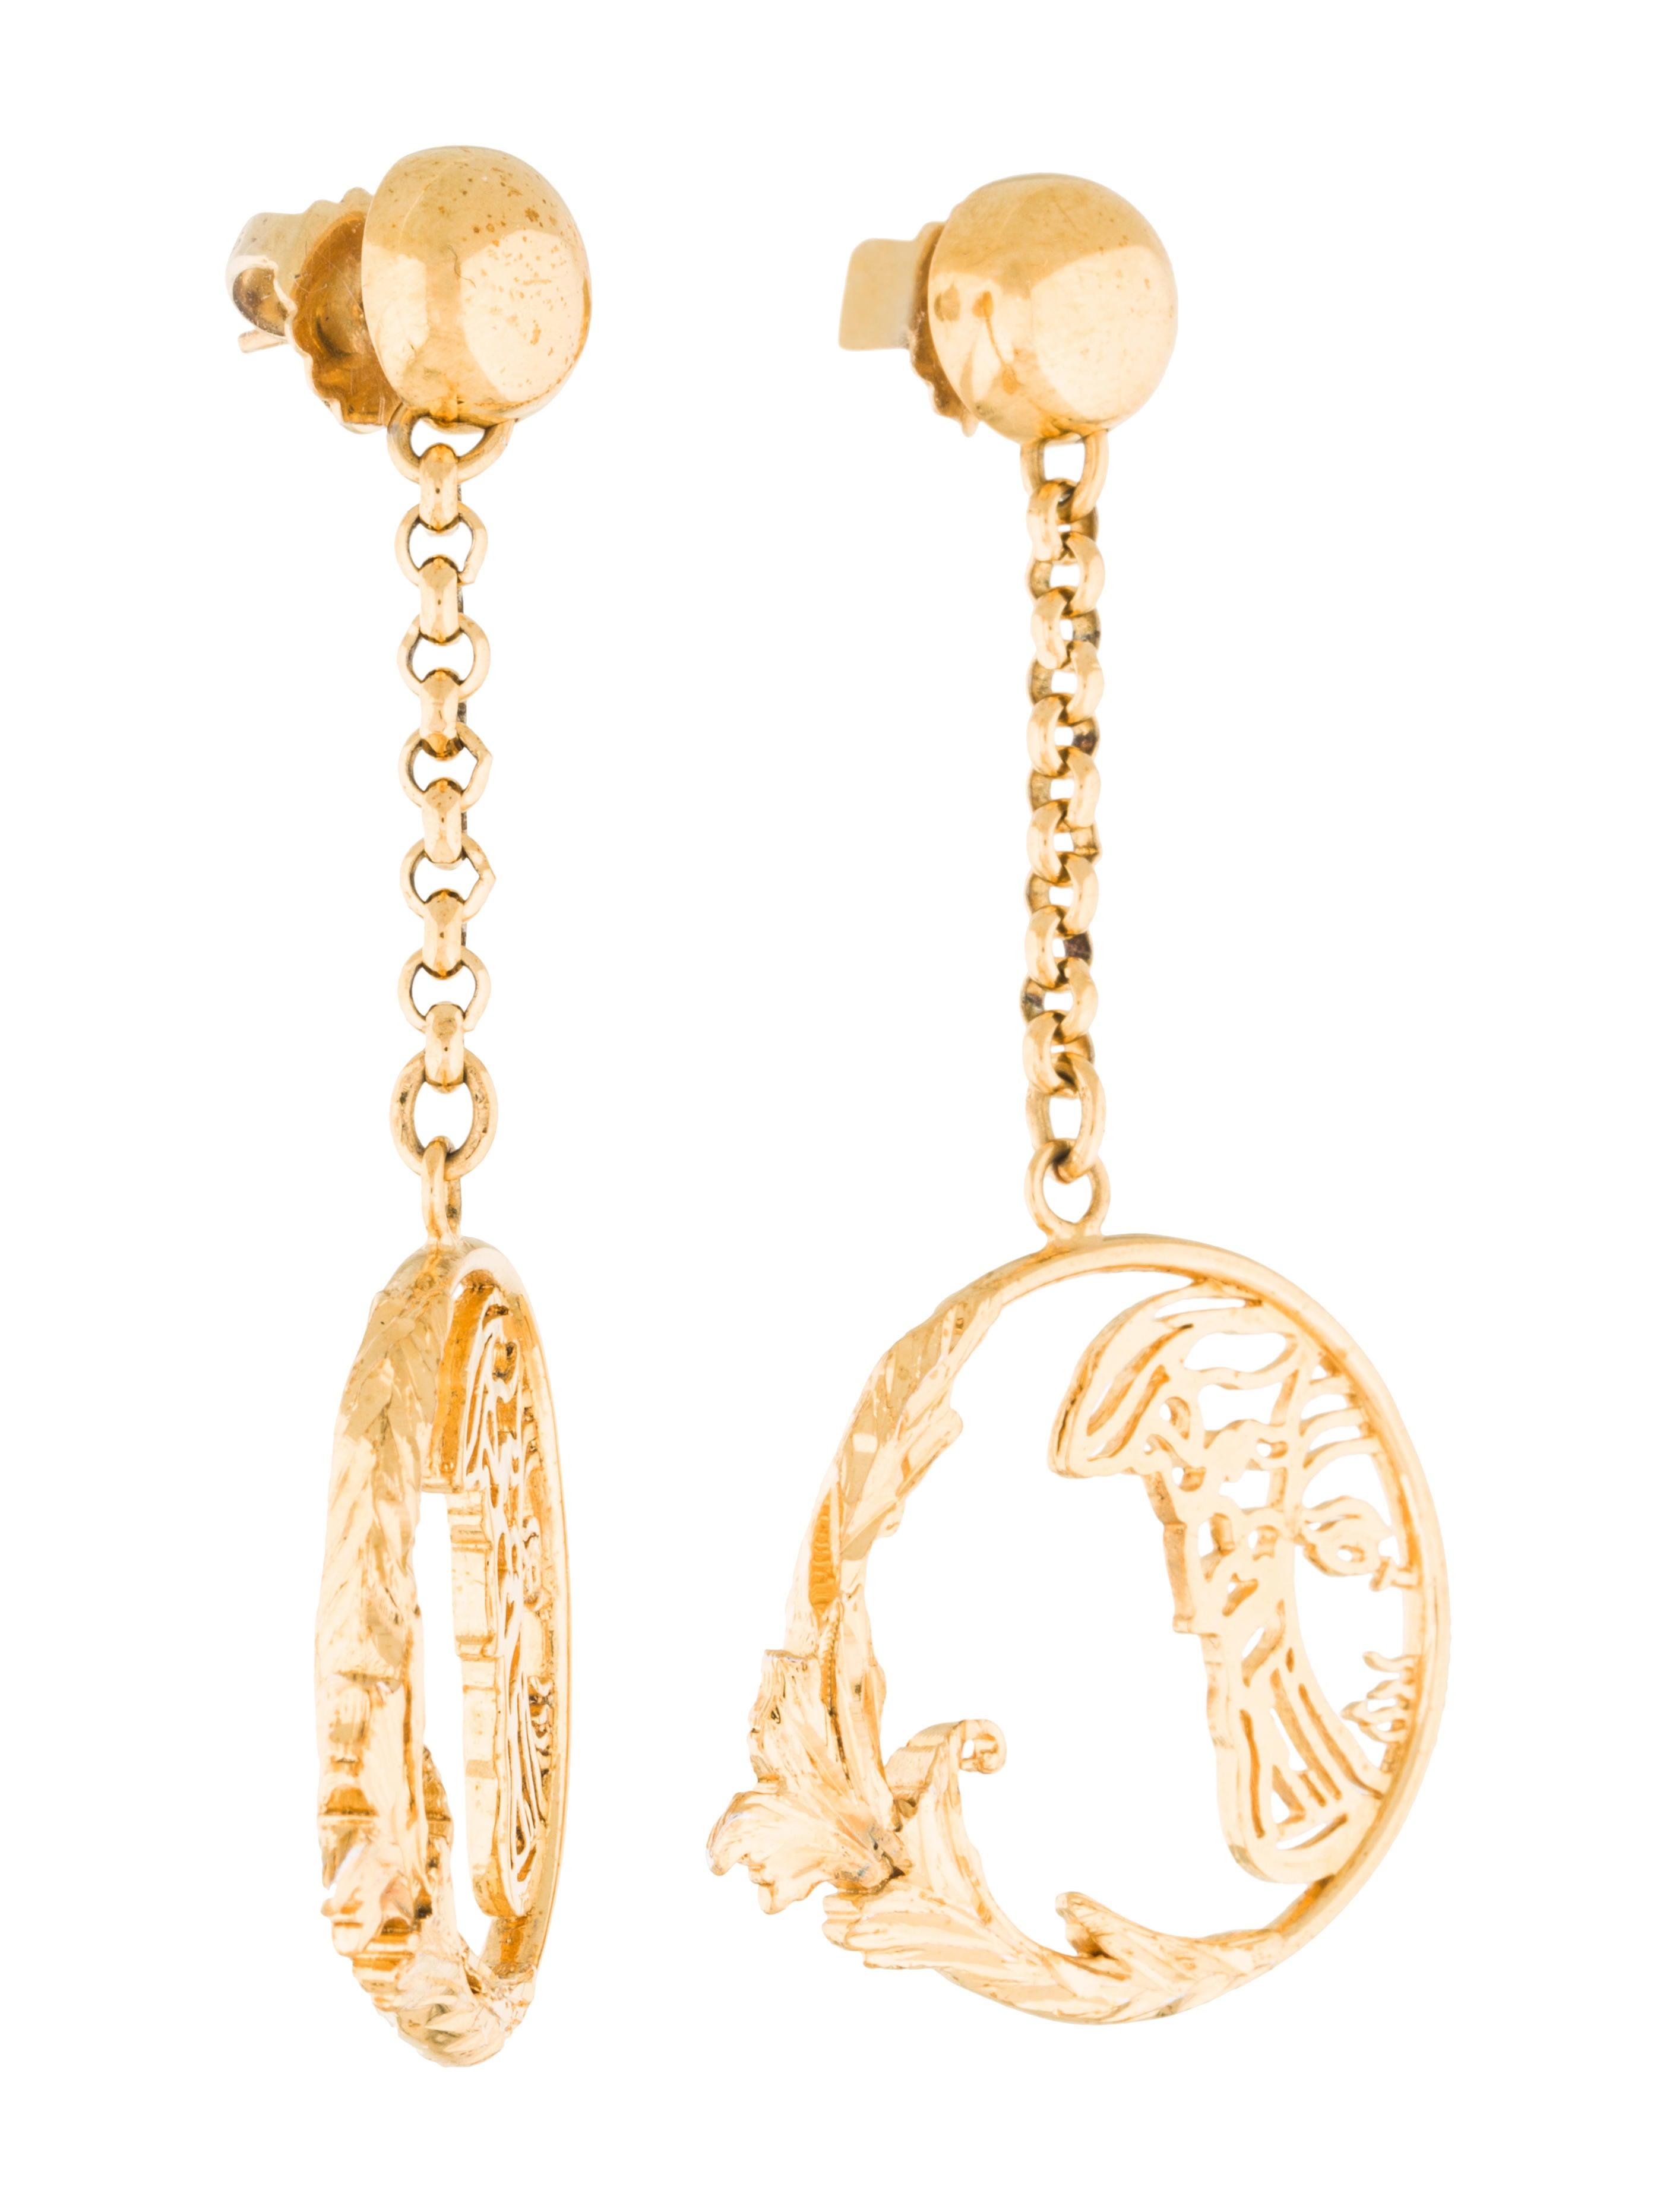 Versace Baroque Medusa Drop Earrings Earrings VES30138  : VES301383enlarged from www.therealreal.com size 2822 x 3724 jpeg 330kB